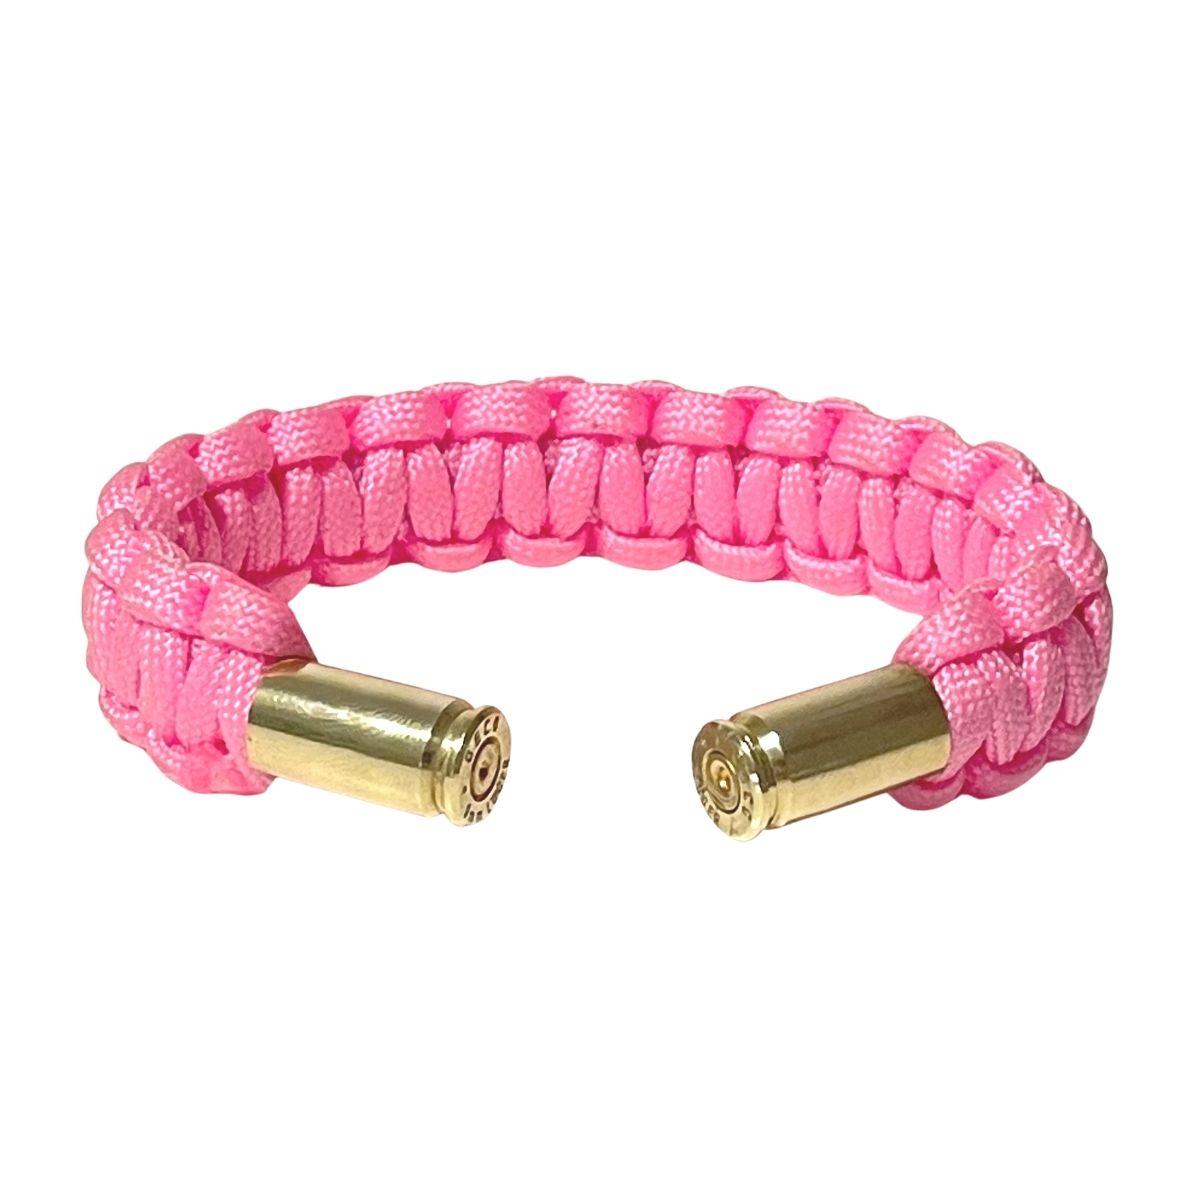 Handgjorda Paracord Armband - Rosa